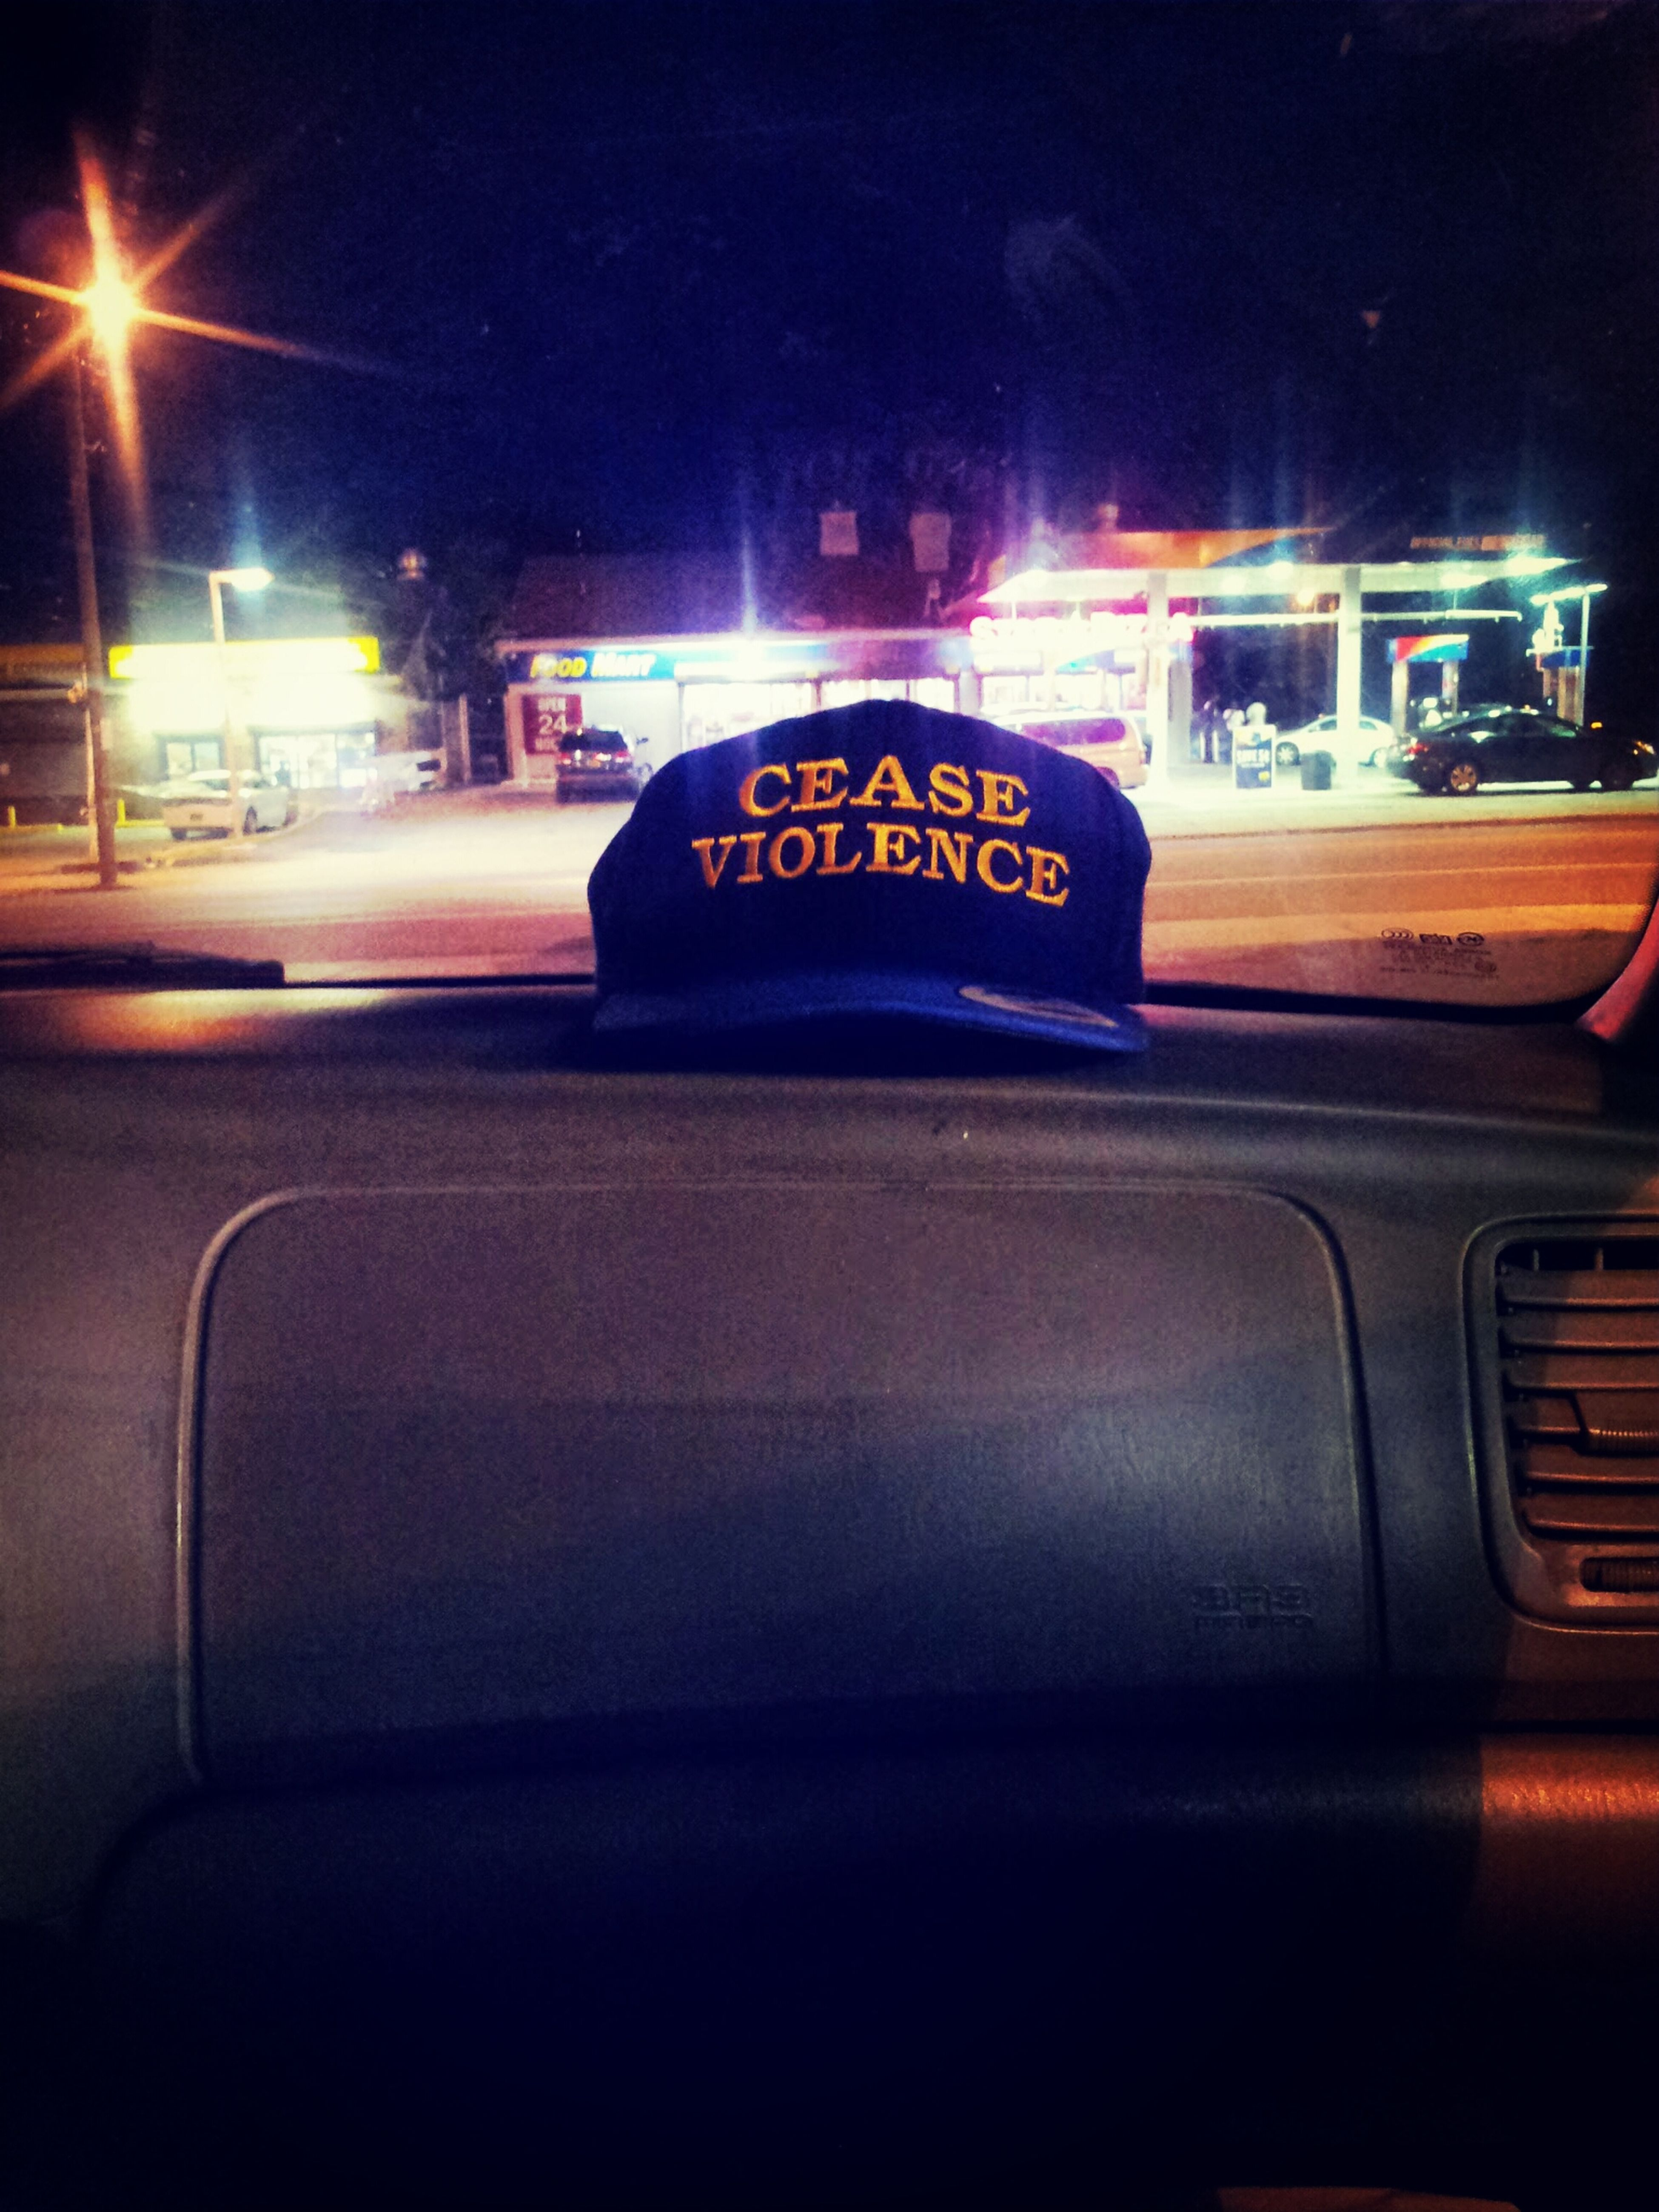 Cease Violence Wilmington Weallwegot